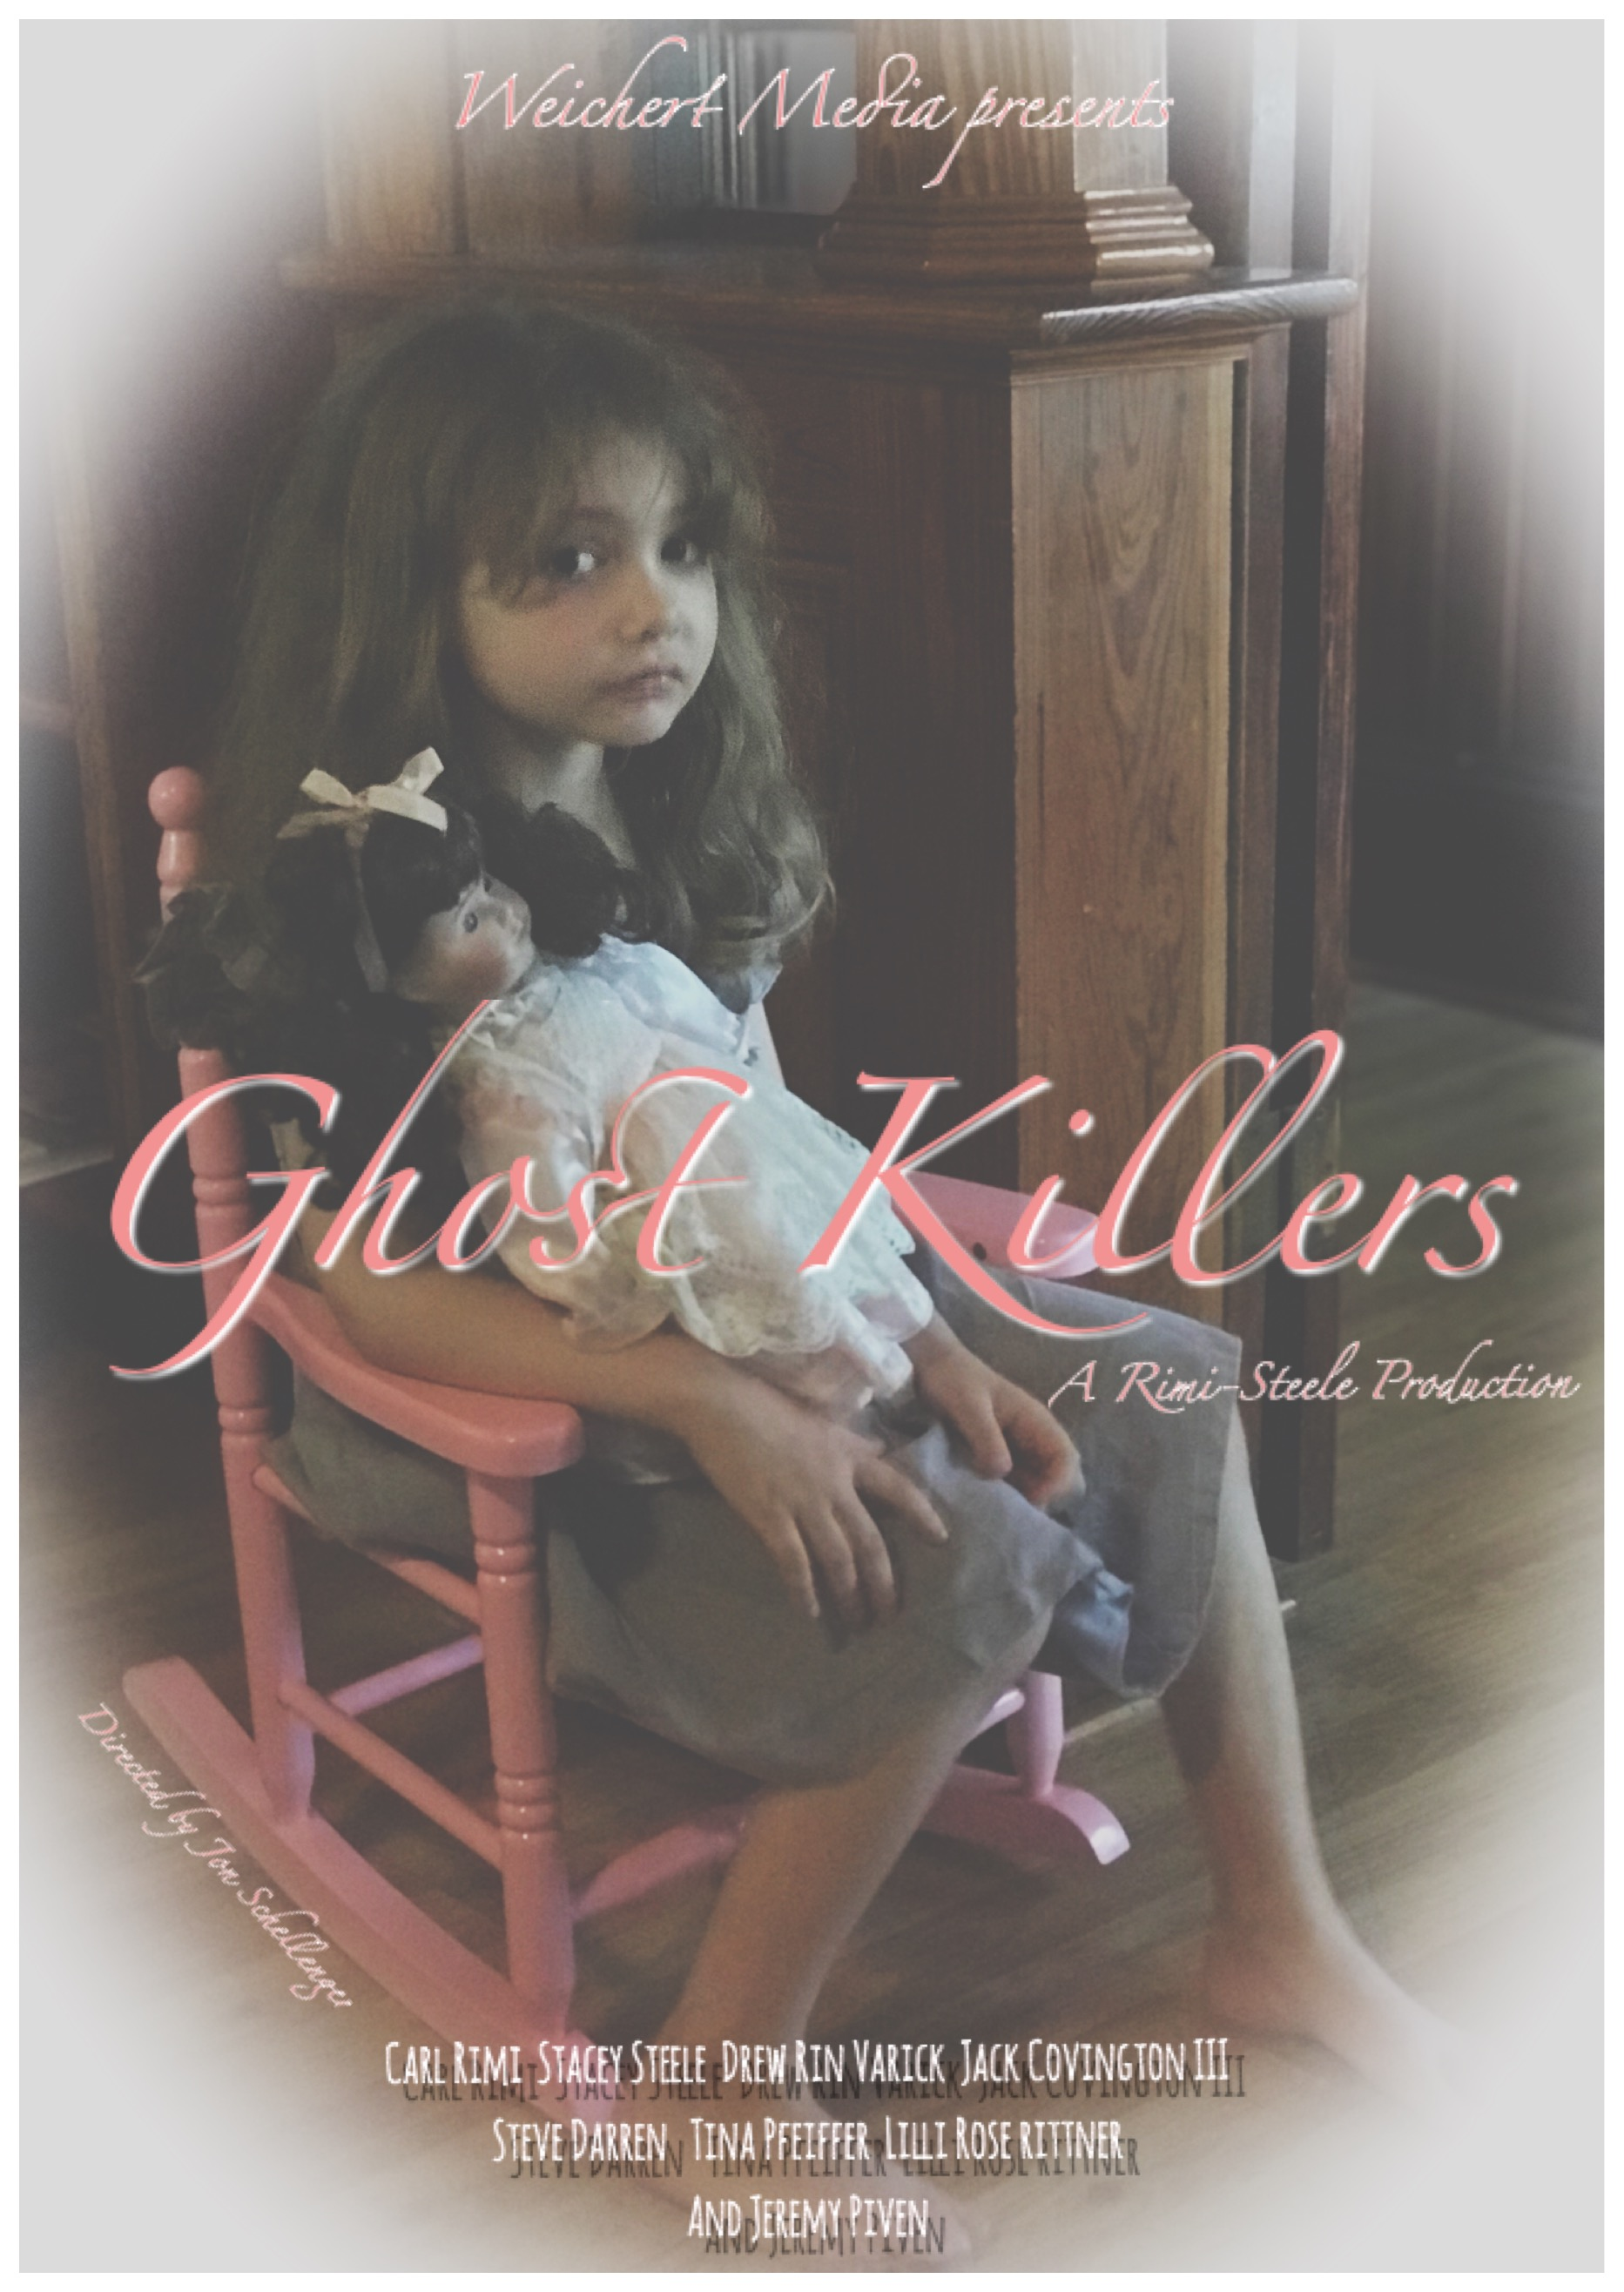 Ghost Killers - IMDb